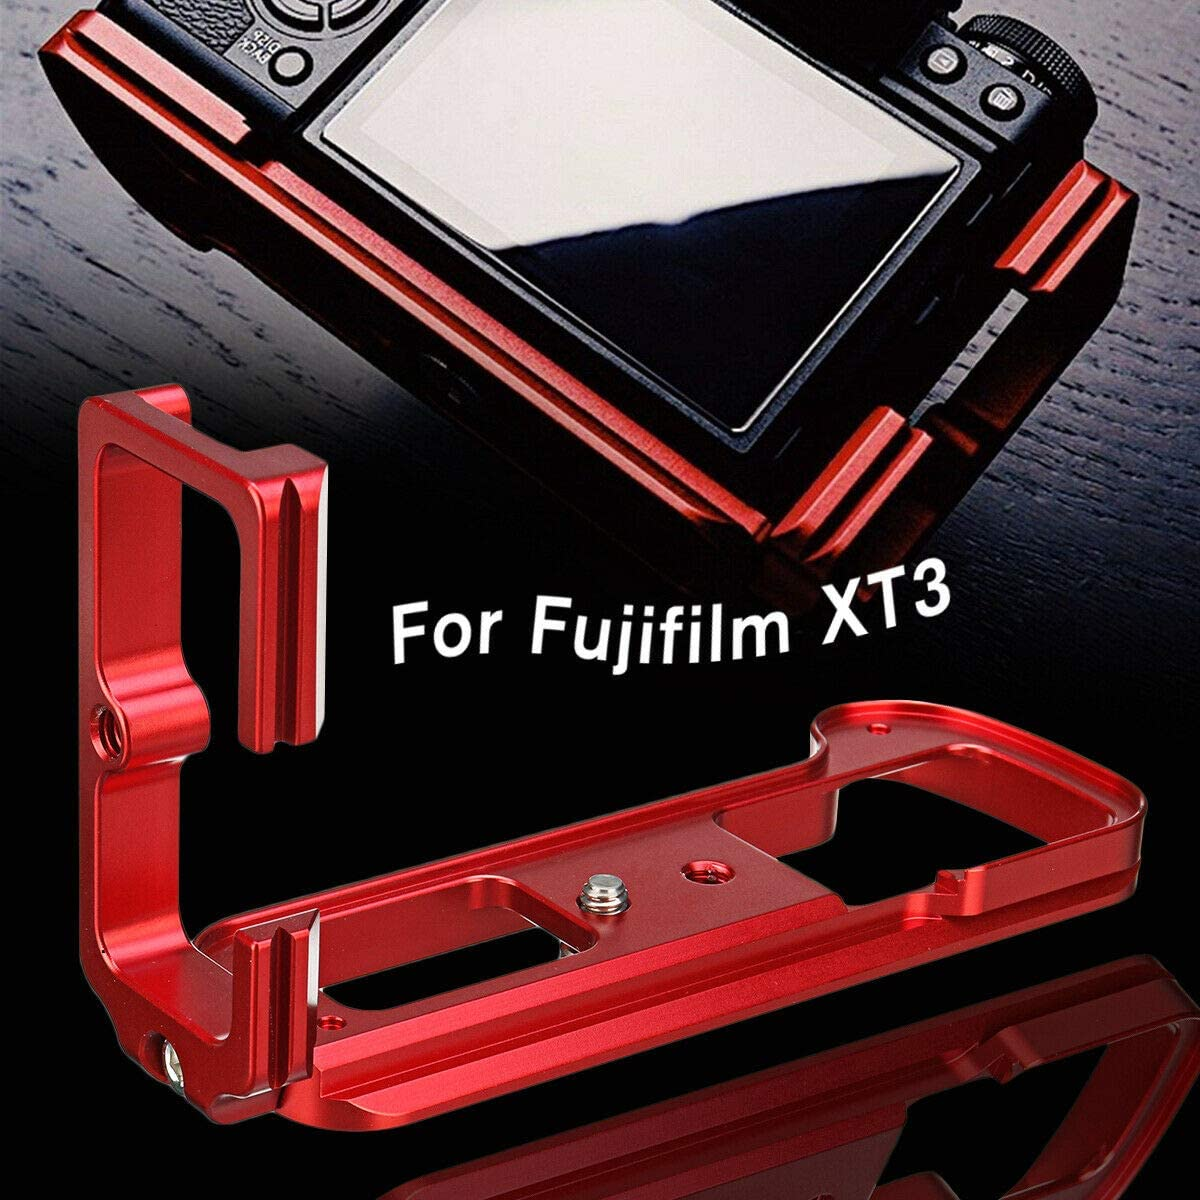 AKDSteel Quick Release L-Plate Staffa di montaggio per Fu-ji X-T3 Fu-jifilm XT3 ARCA in buona stabilit/à